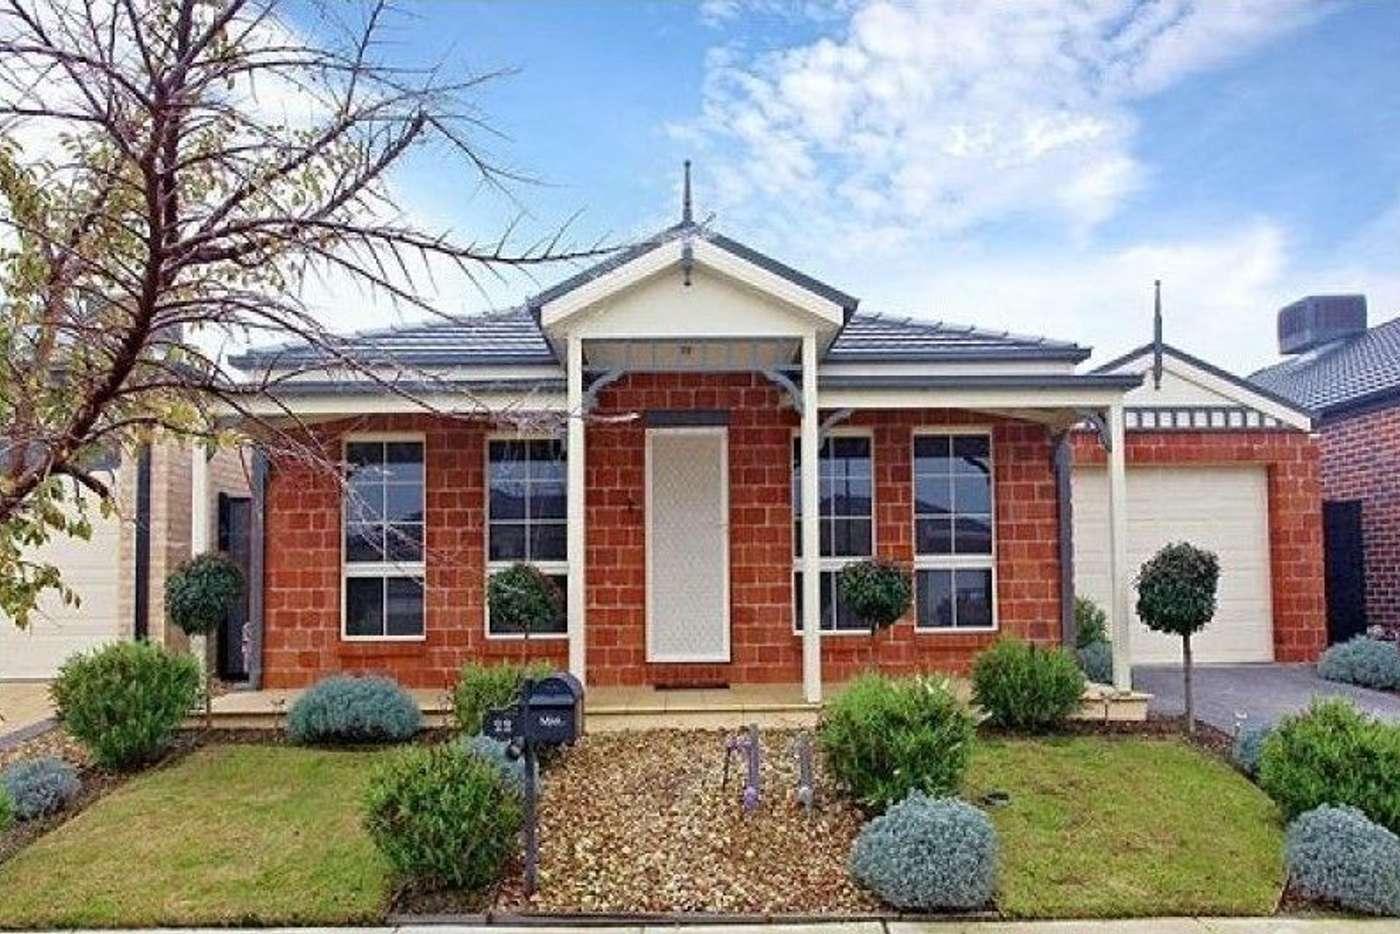 Main view of Homely house listing, 22 Ebony Circuit, Craigieburn VIC 3064